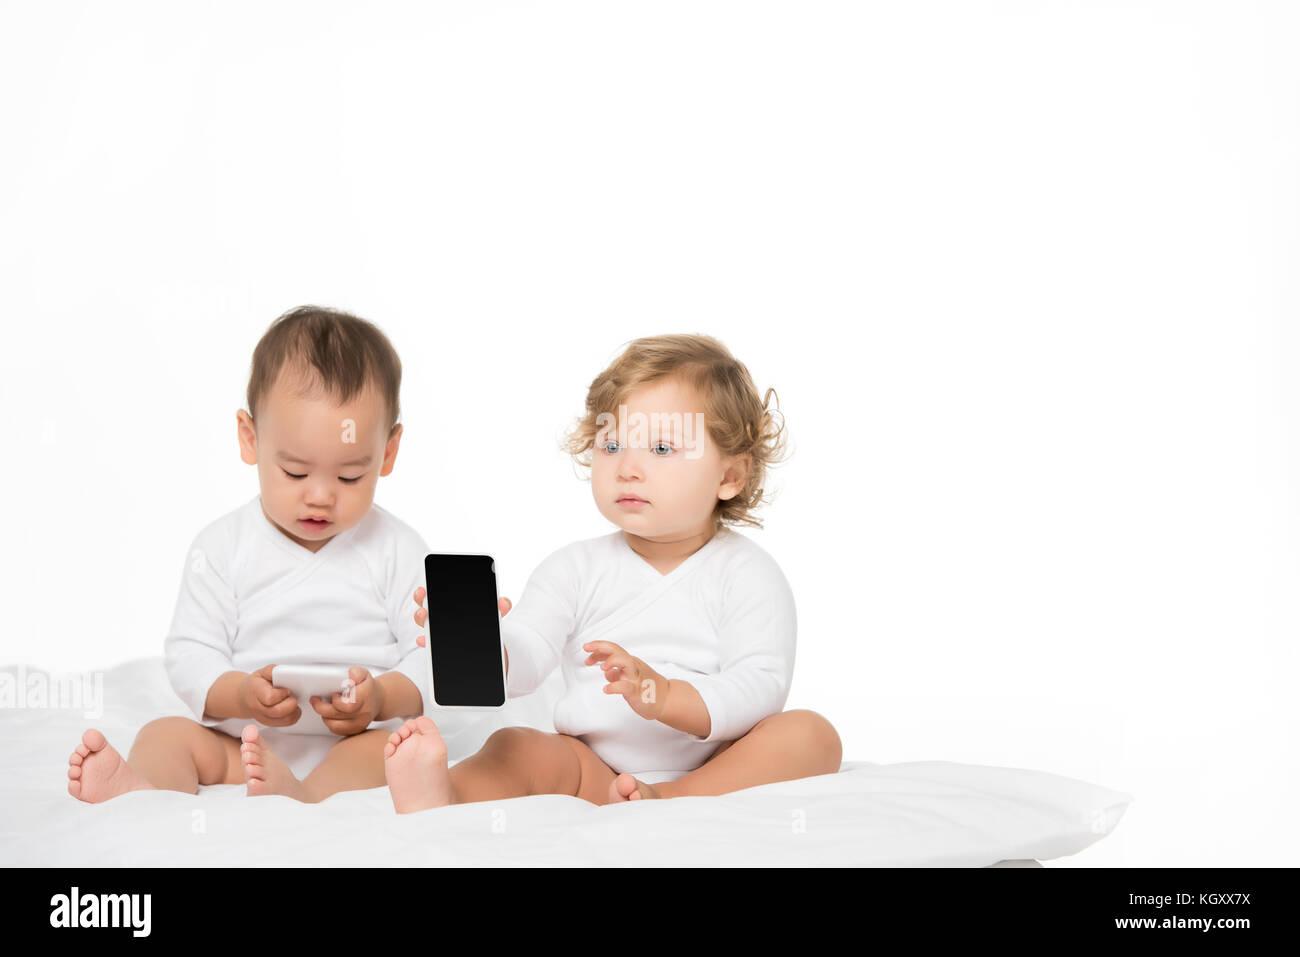 Multikulturelle Kleinkinder mit digitalen Smartphones Stockbild